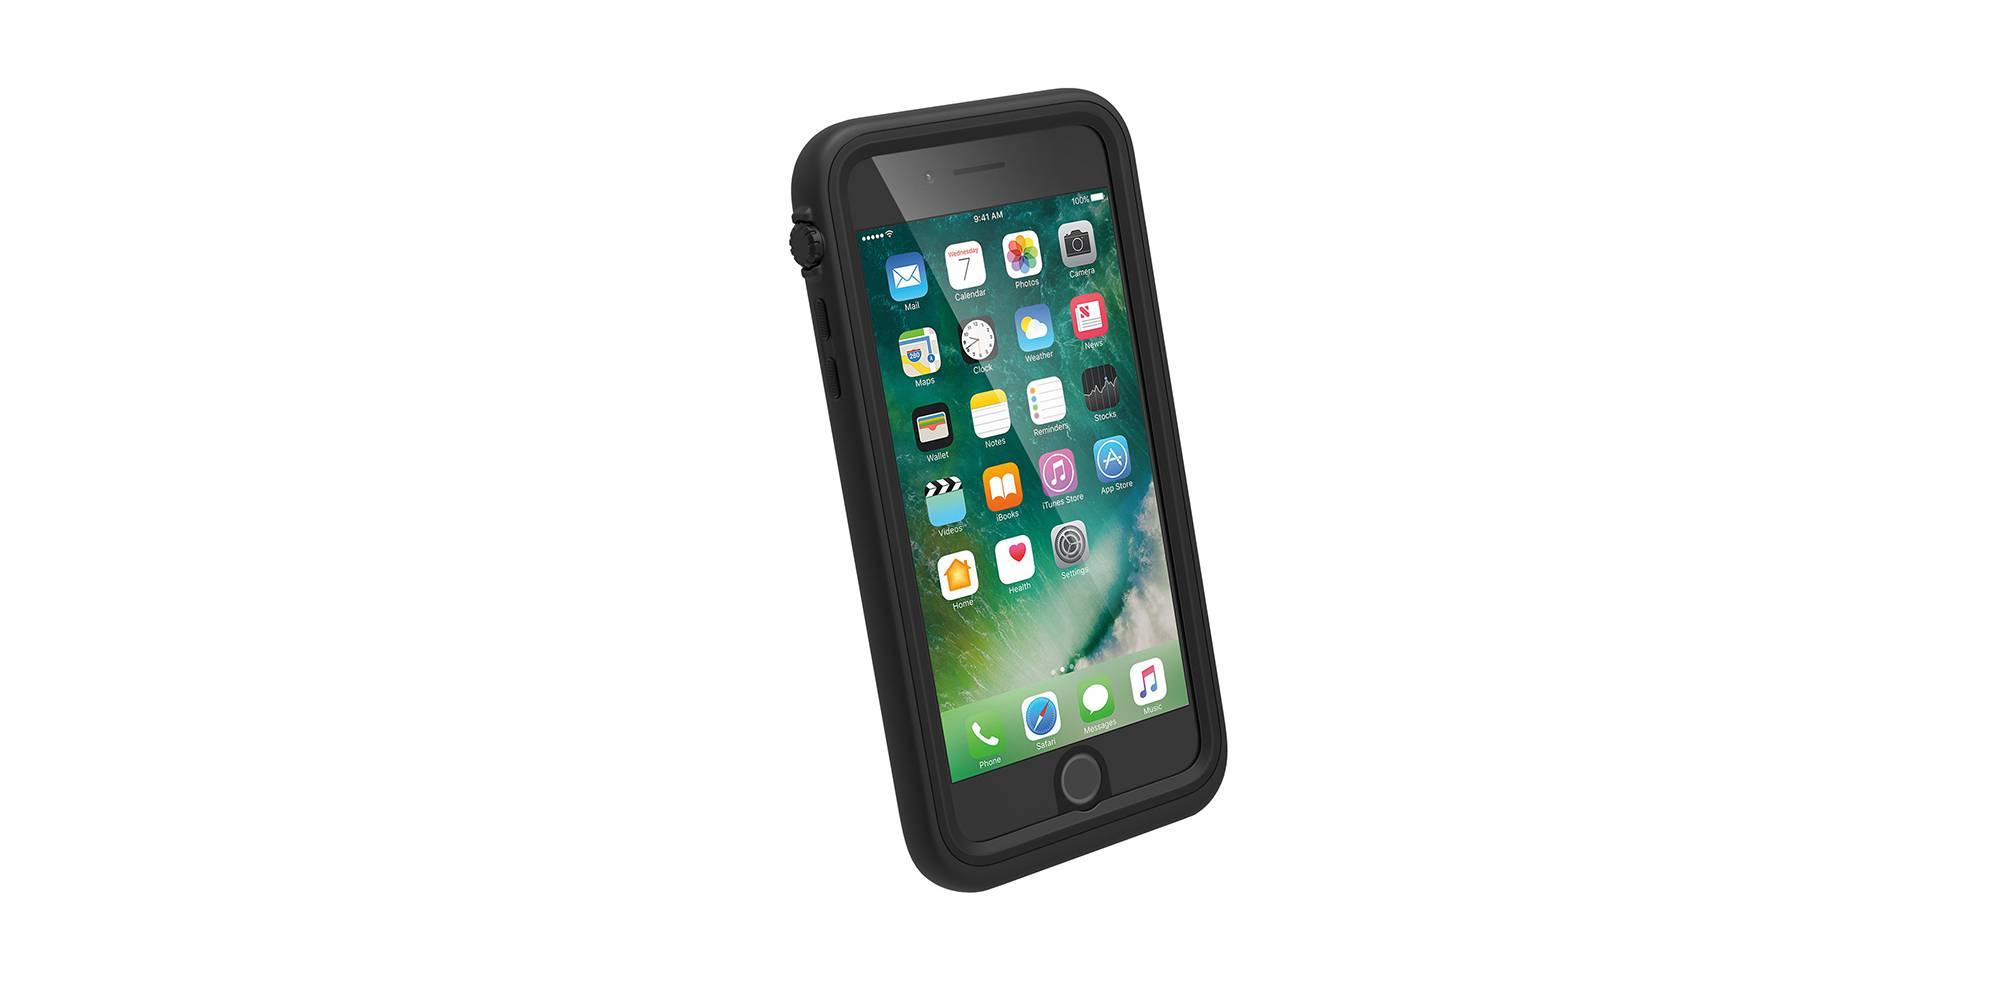 iphone 7 Plus come disattivare internet